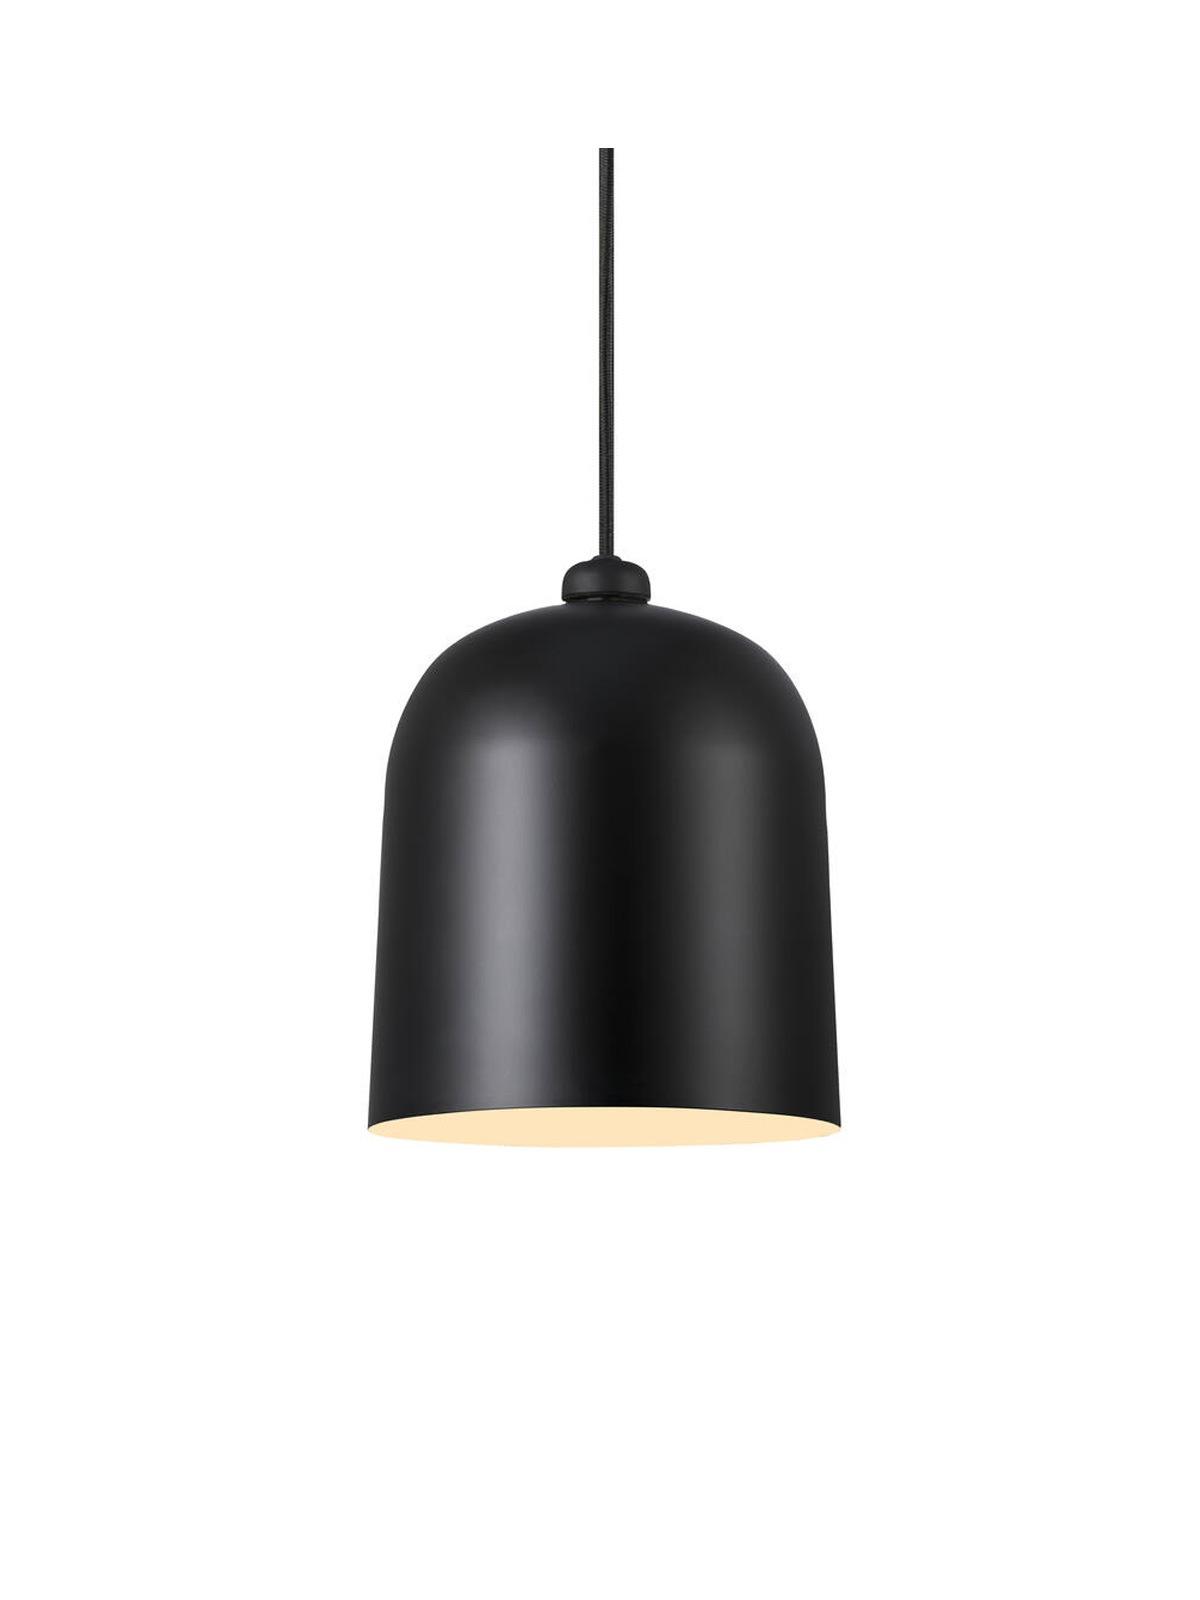 Design for the People Angle Lampe DeisgnOrt Leuchten Berlin